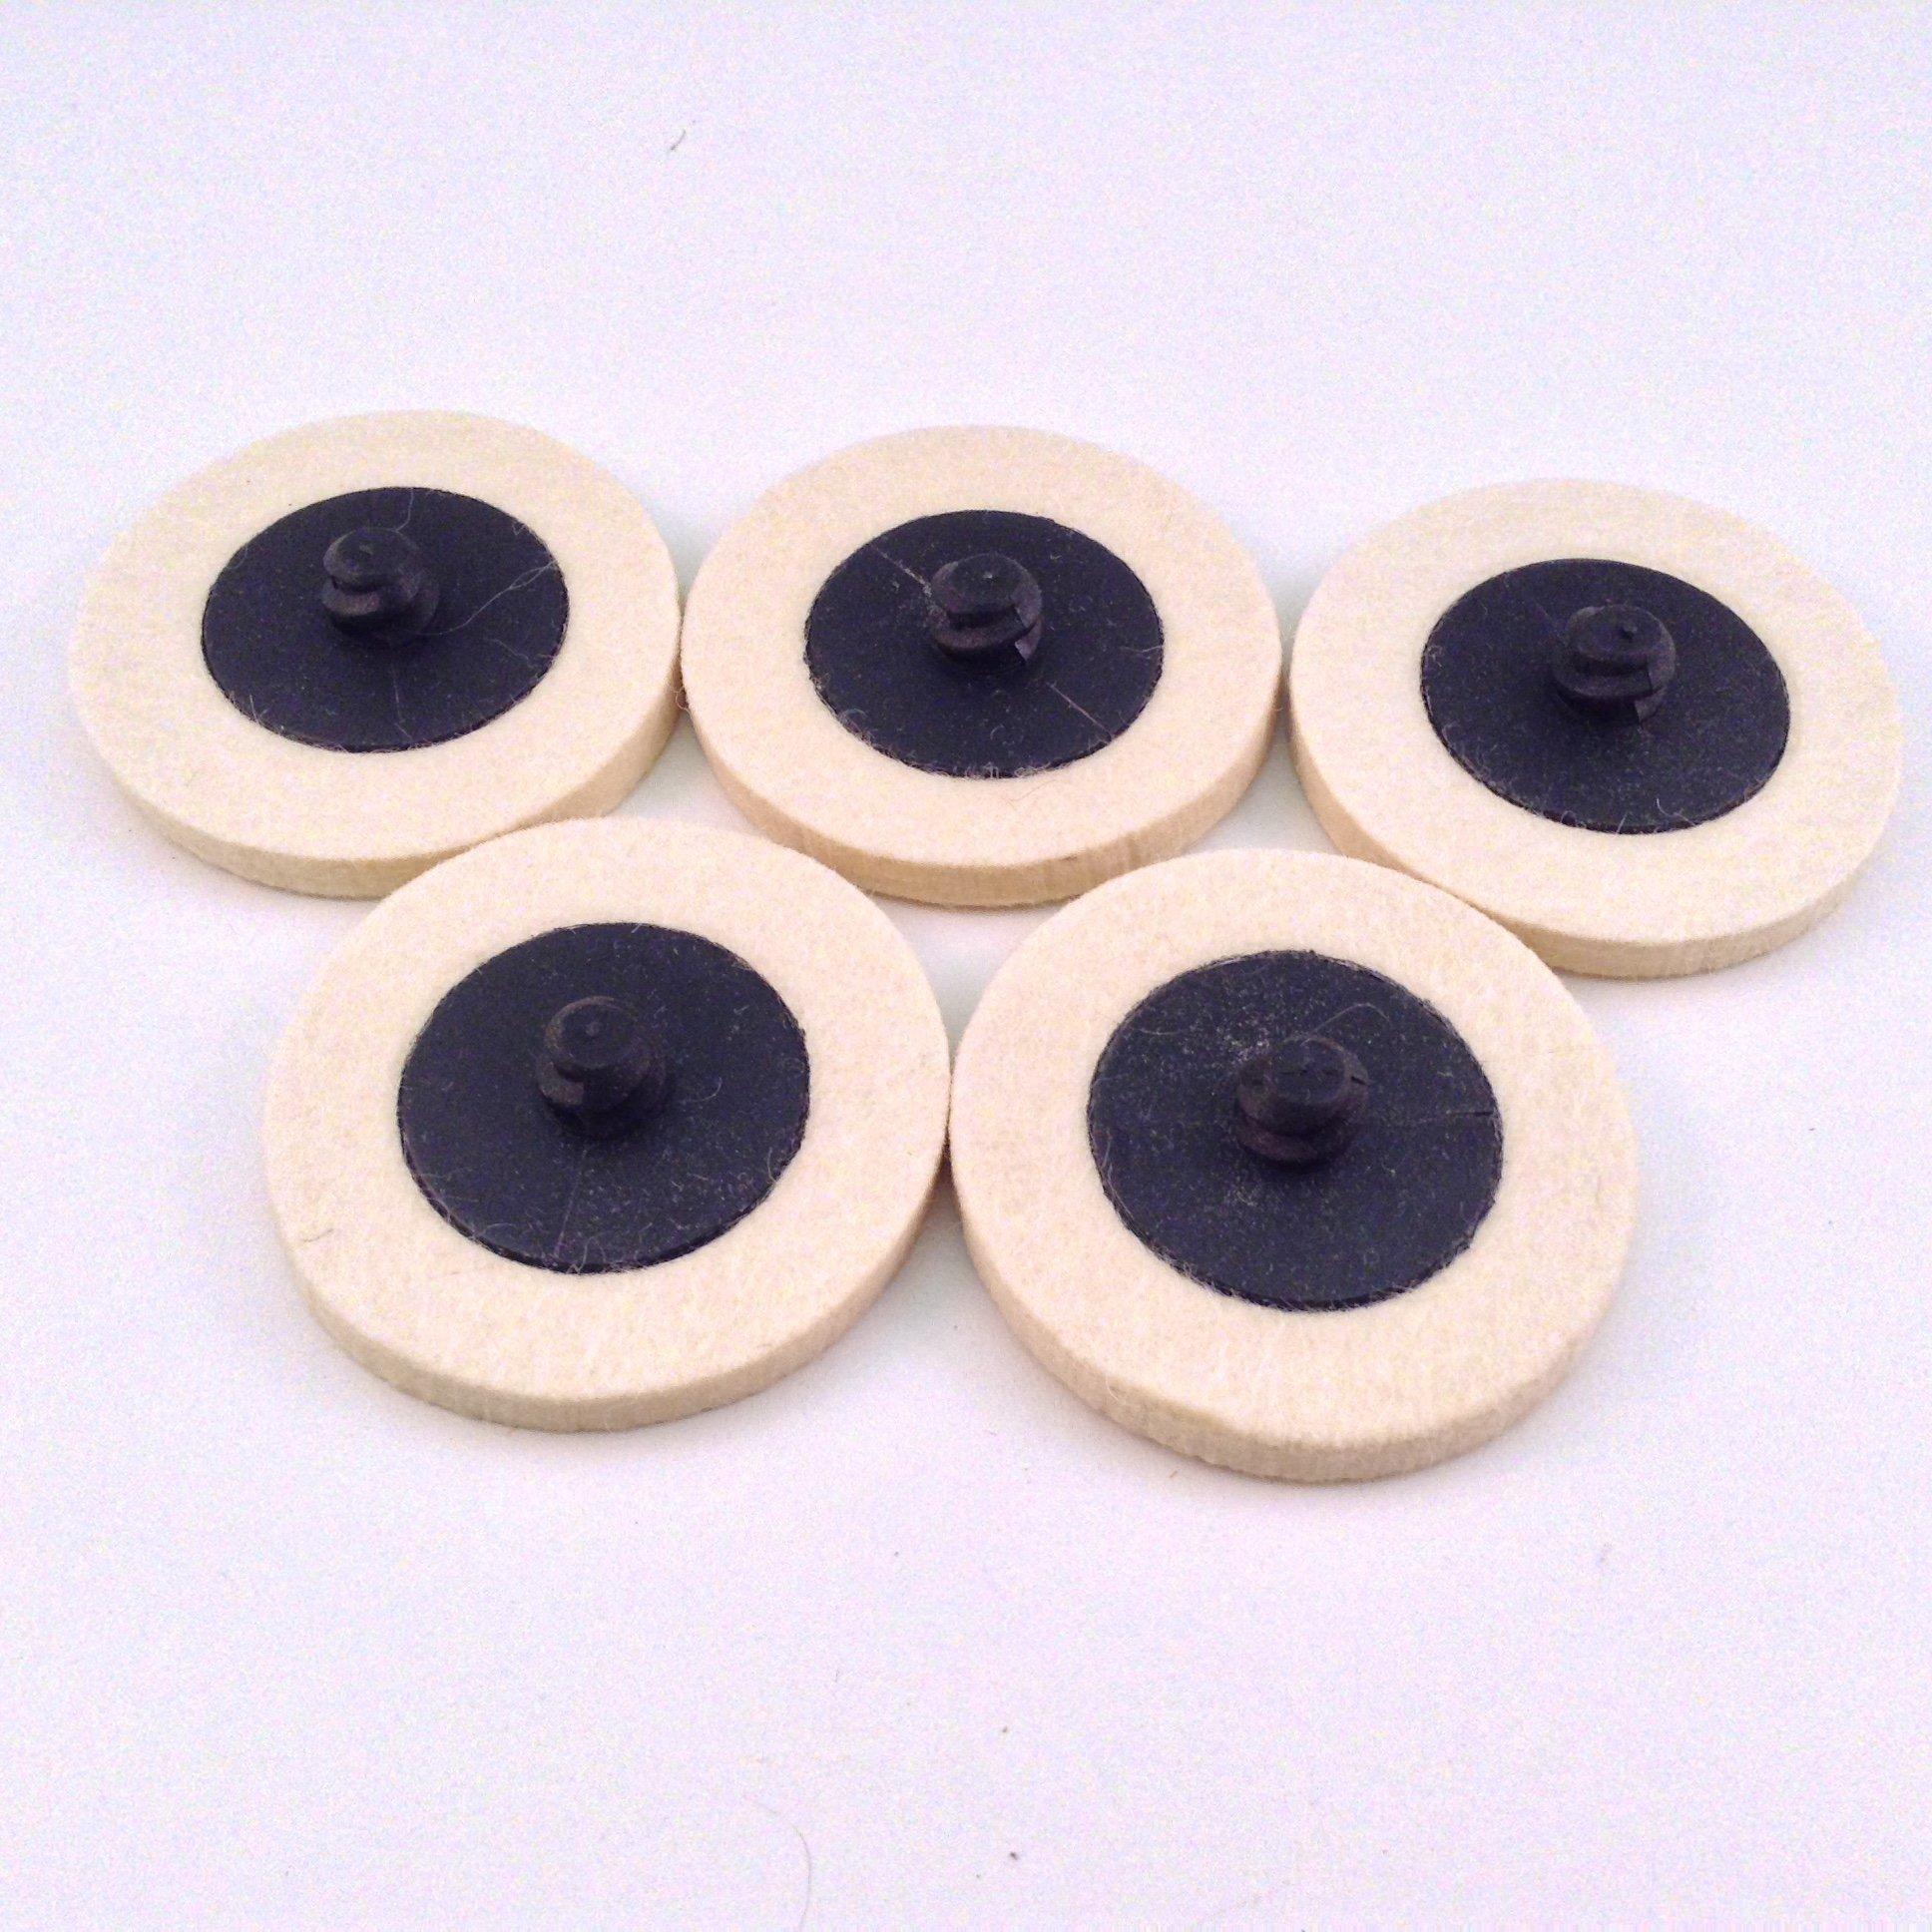 "5pc Roloc Style 2"" Wool QC Disc Polishing Buffing Pads Wheels"